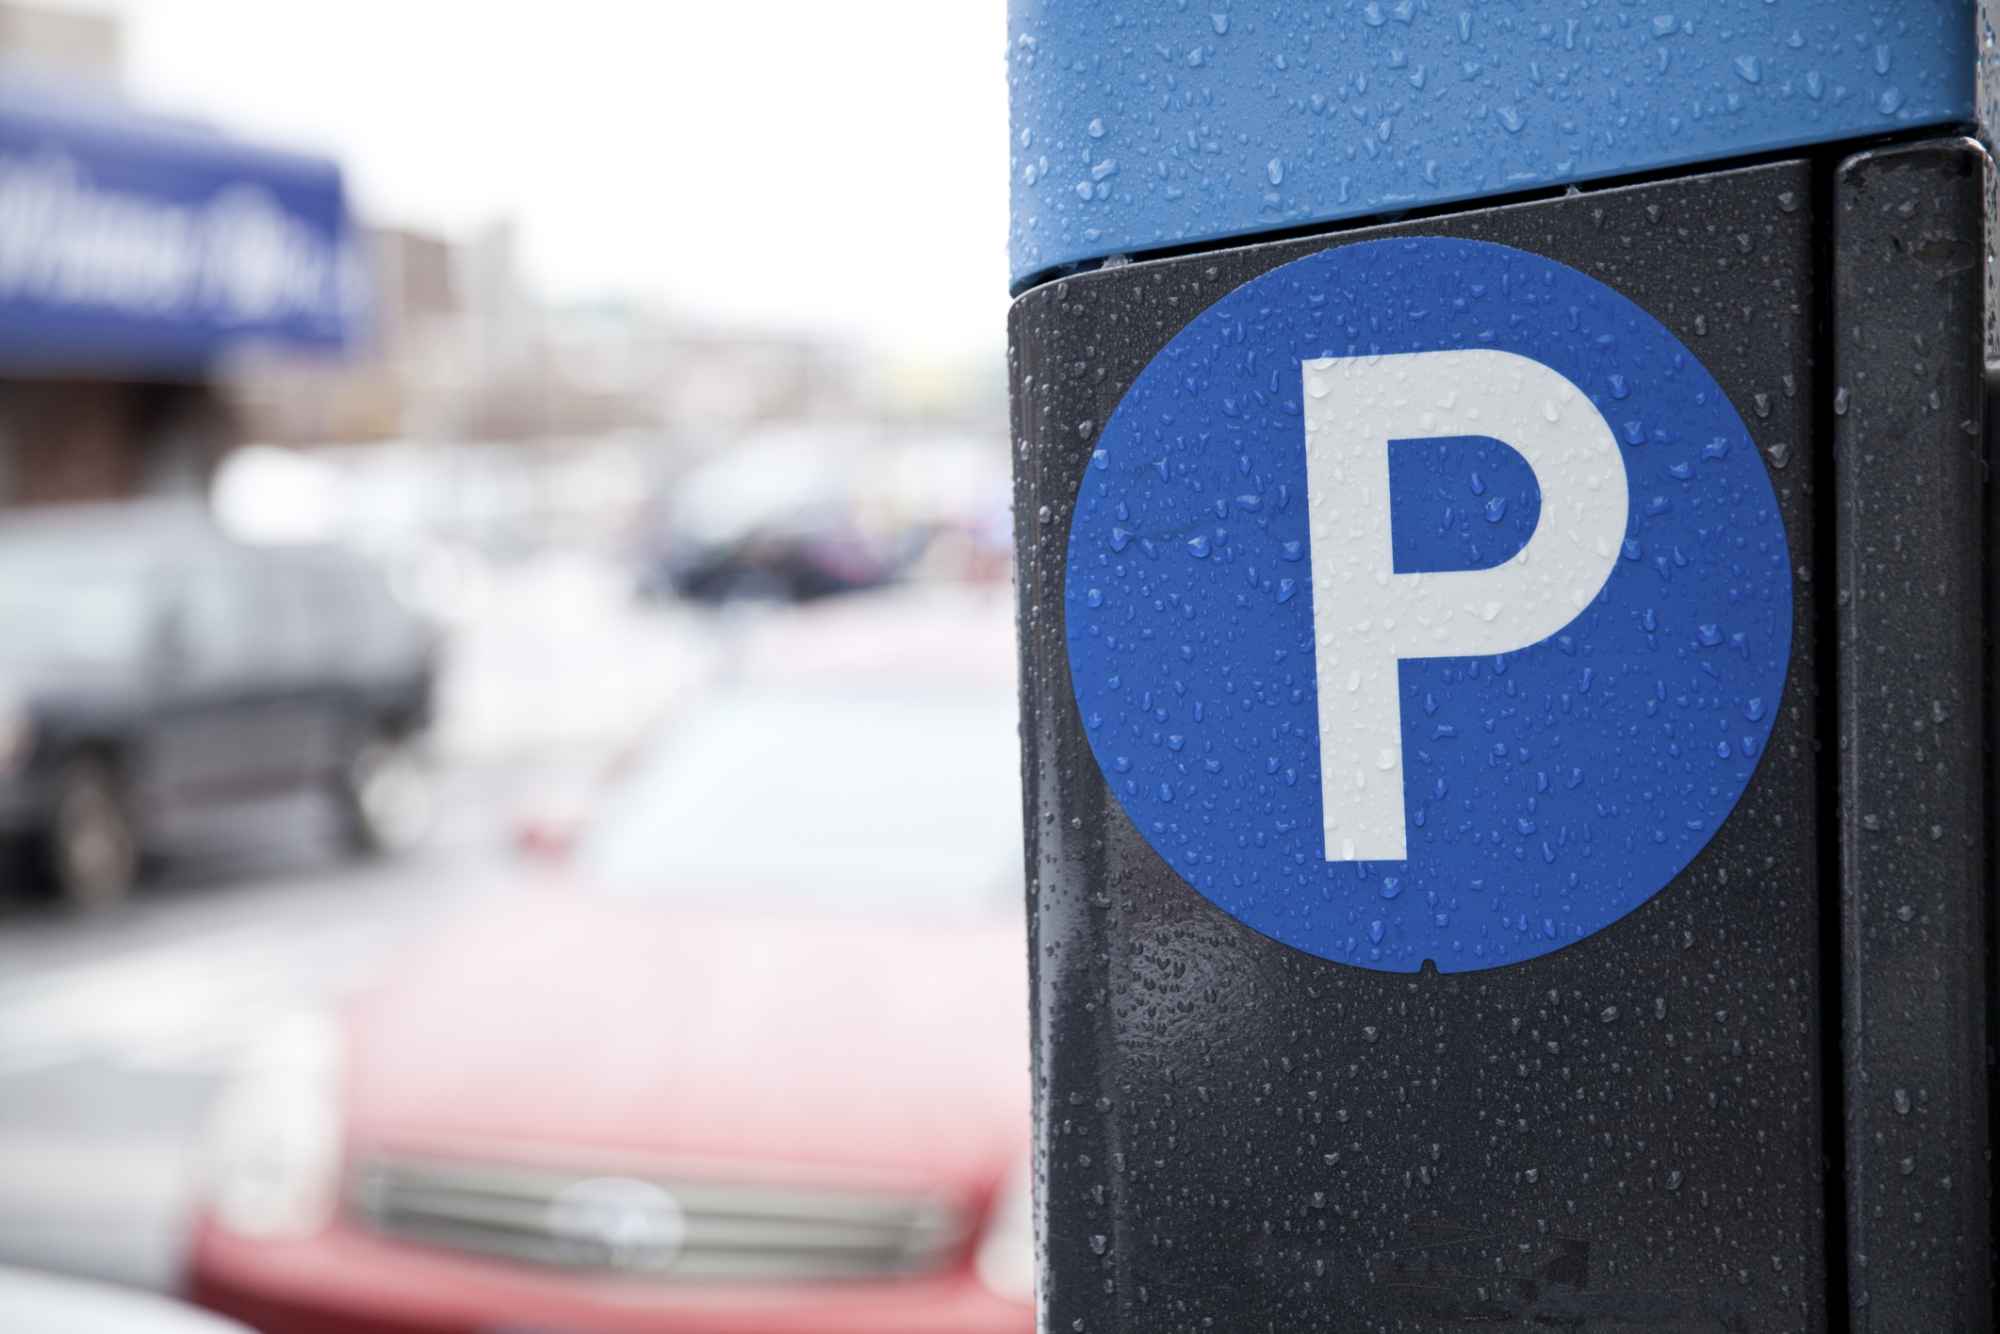 Parking prices have shocked a Kardinya pensioner. Picture: file image